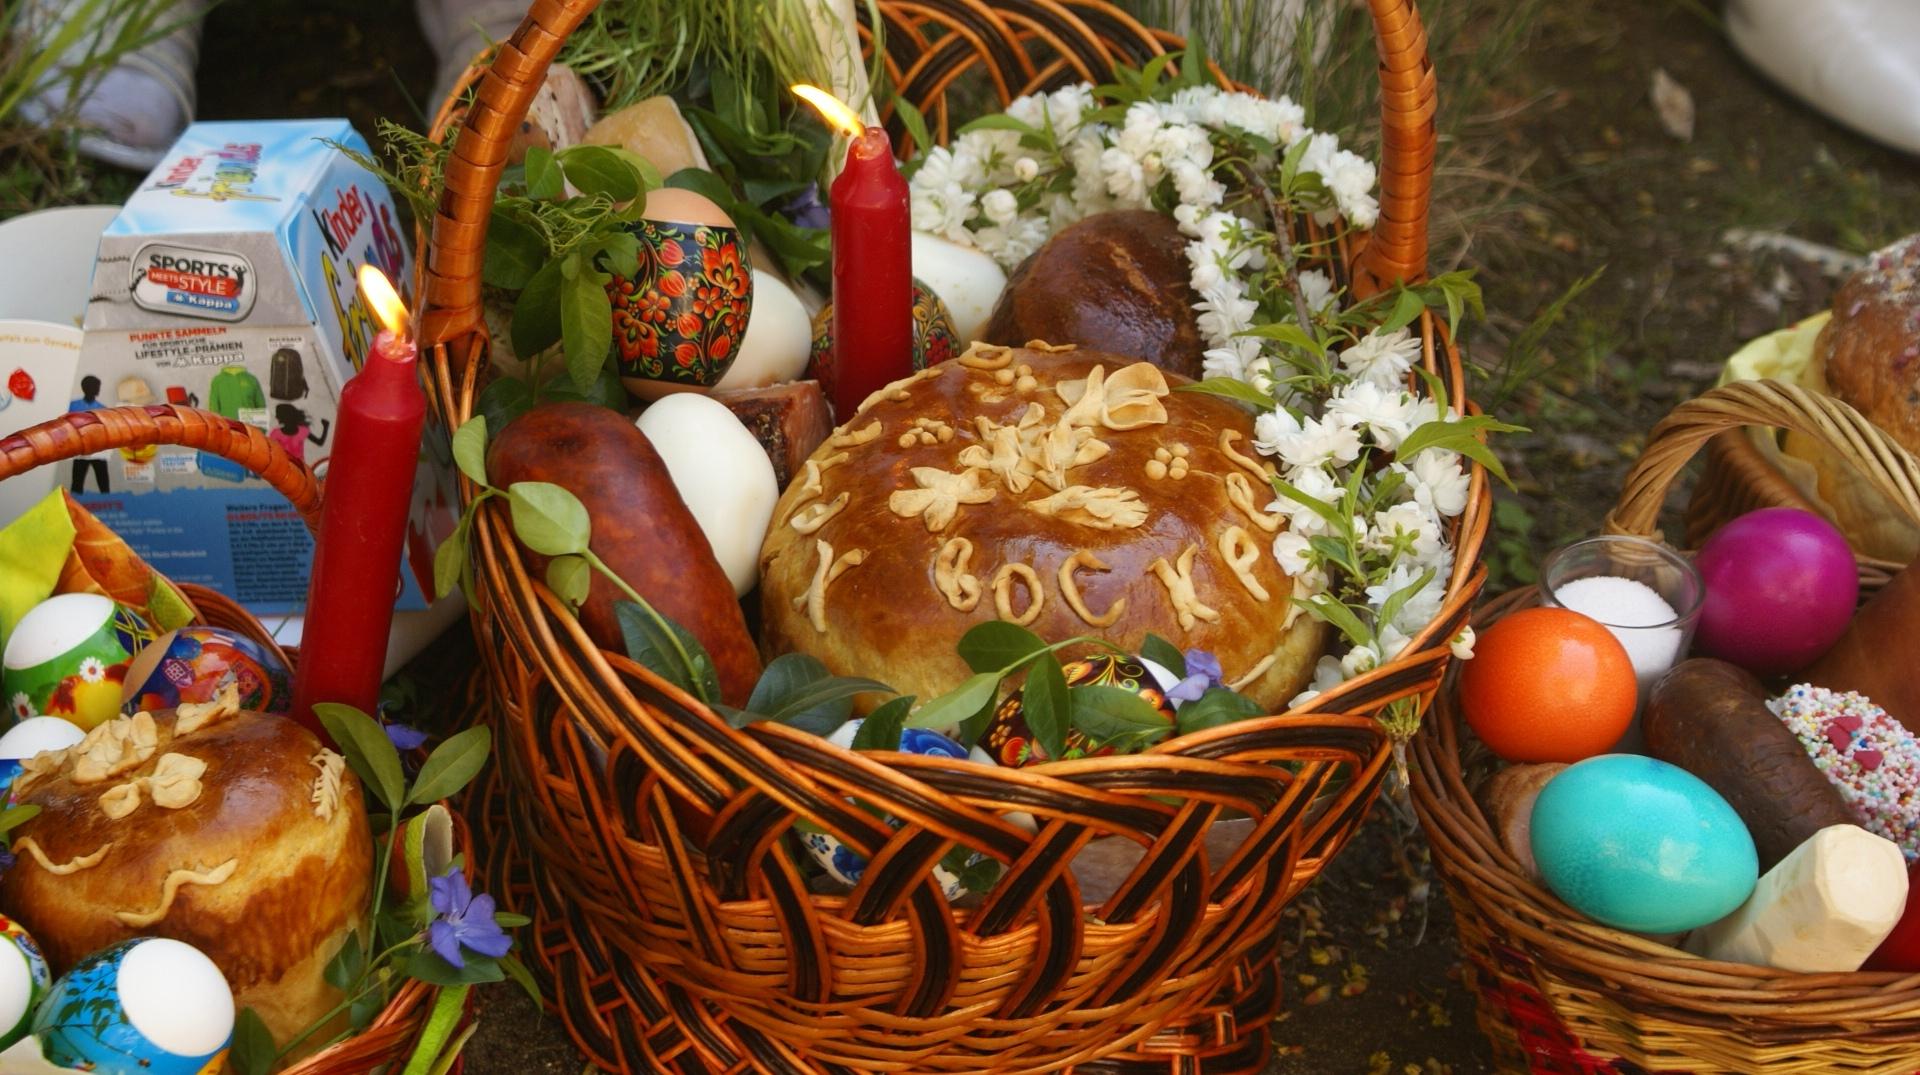 Страви на Великдень 2021: що приготувати, рецепт смачної паски та як її прикрасити. Салати на Пасху